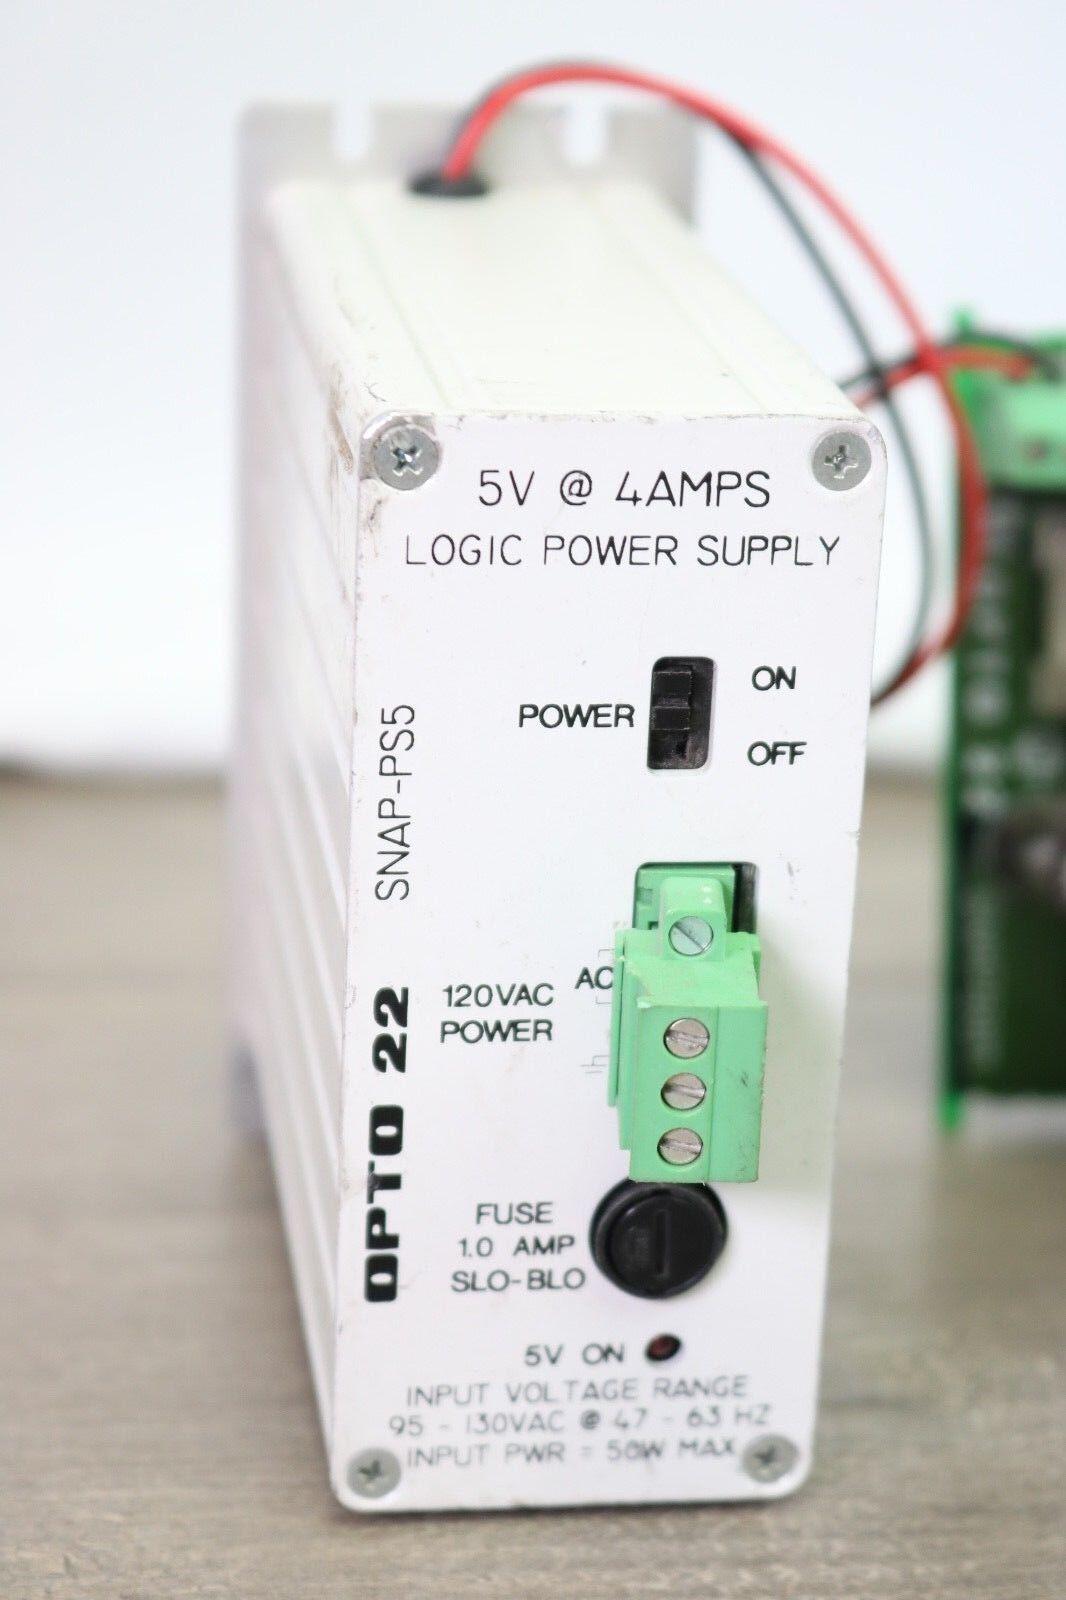 Opto 22 Logic Power Supply SNAP-PS5  1139a